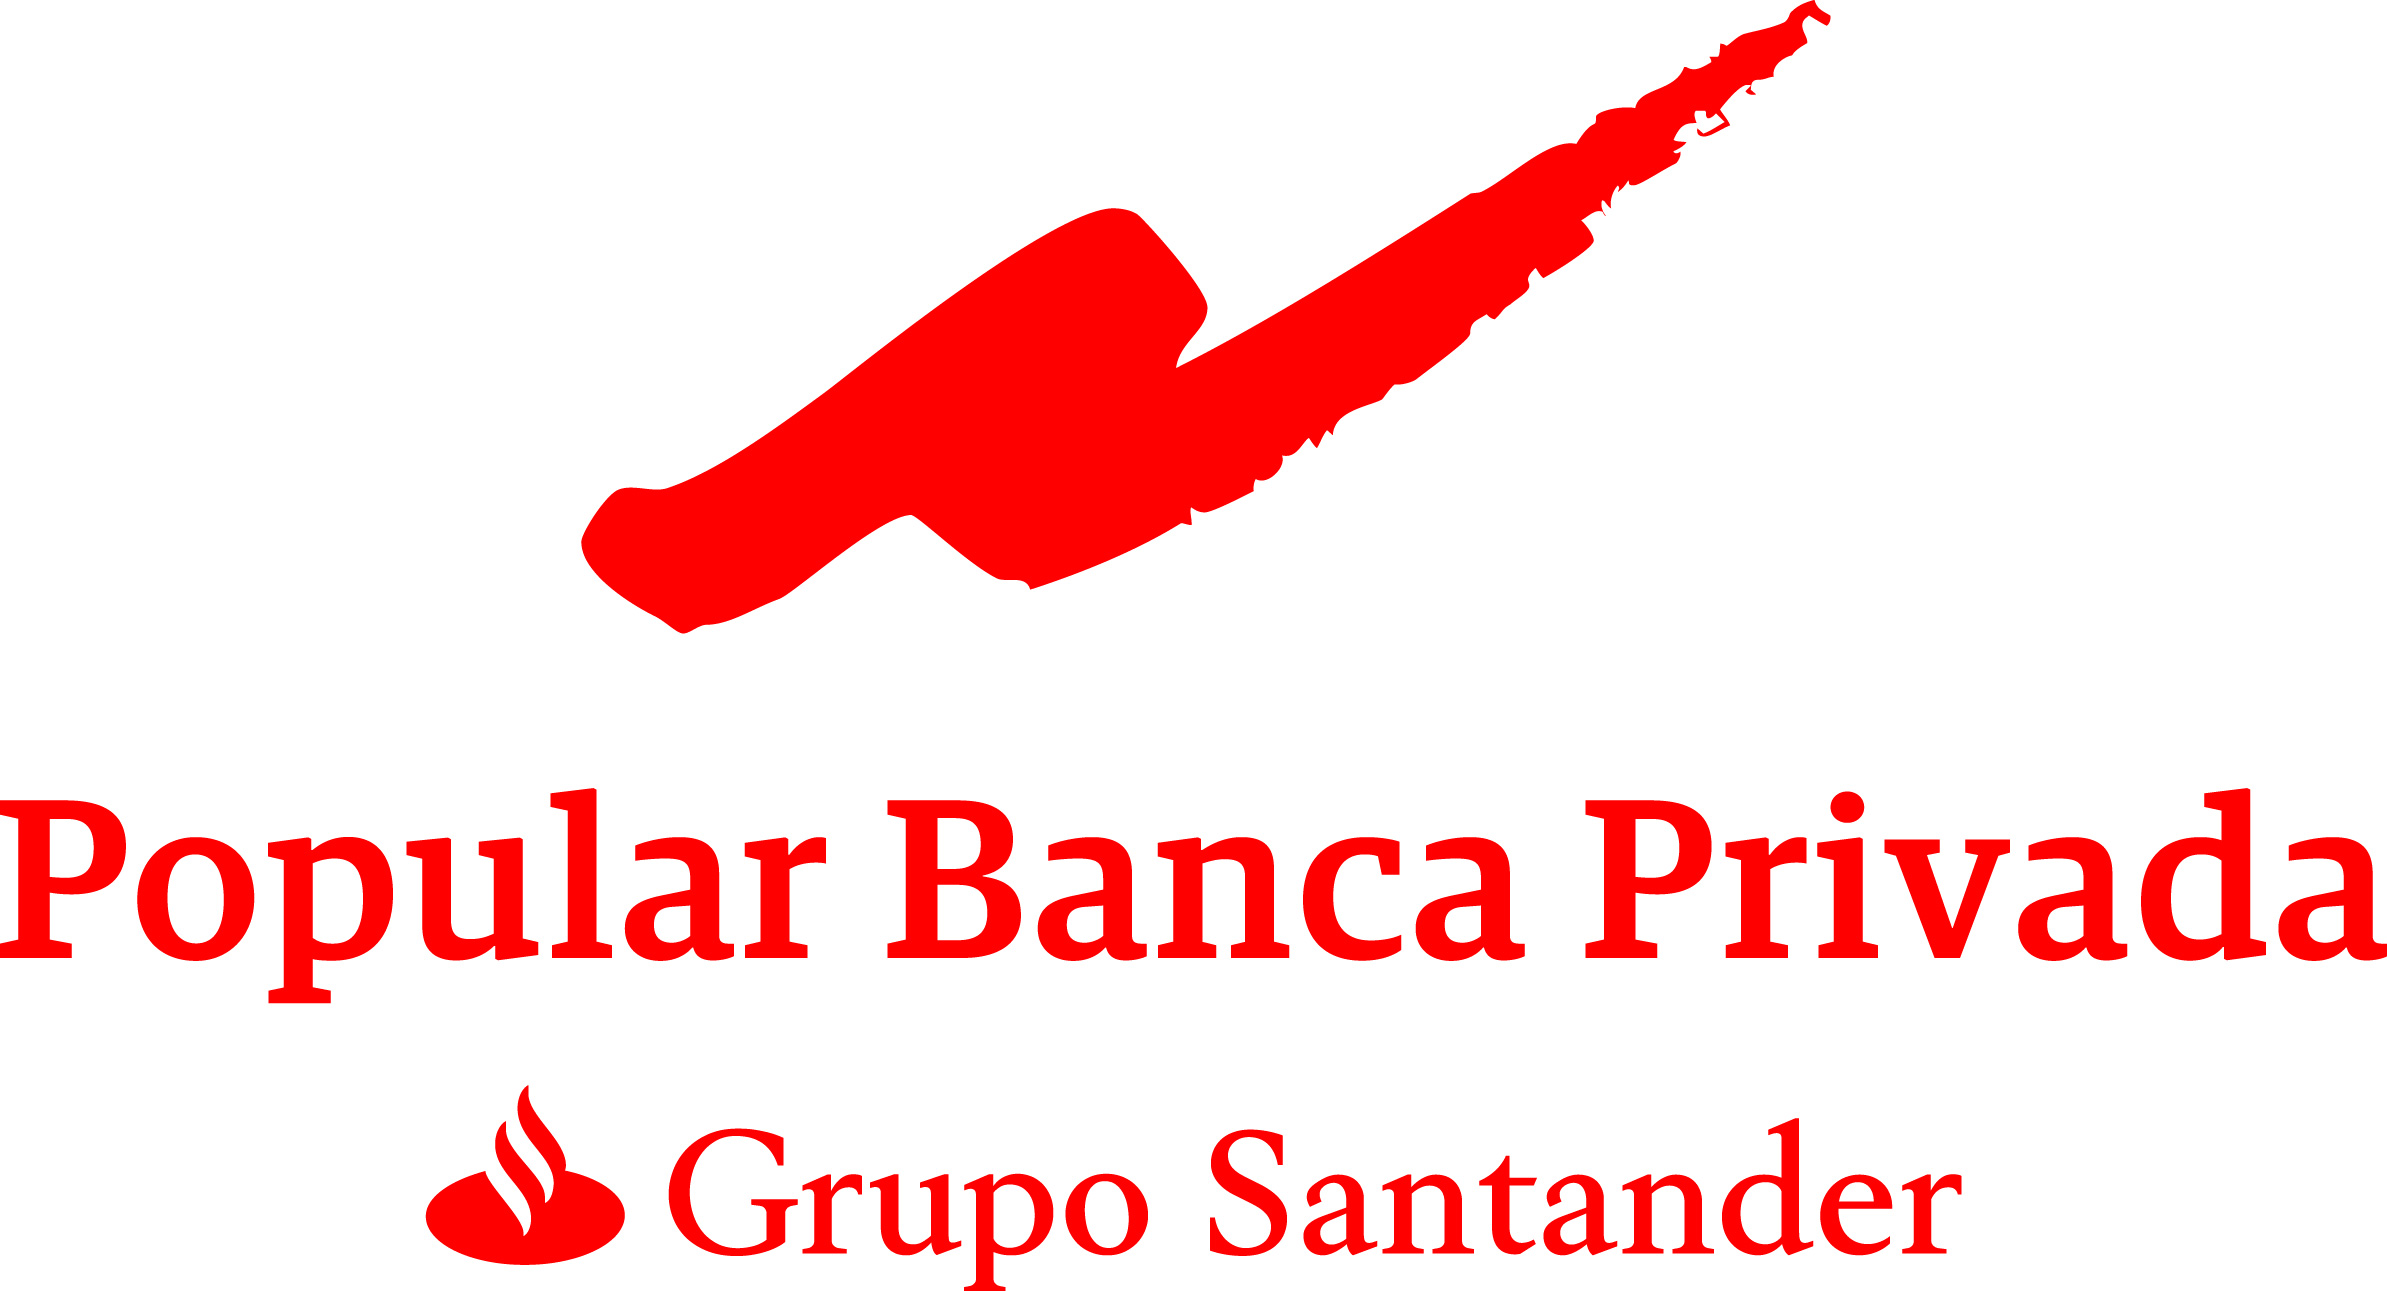 Popular Banca Privada - Grupo Santander